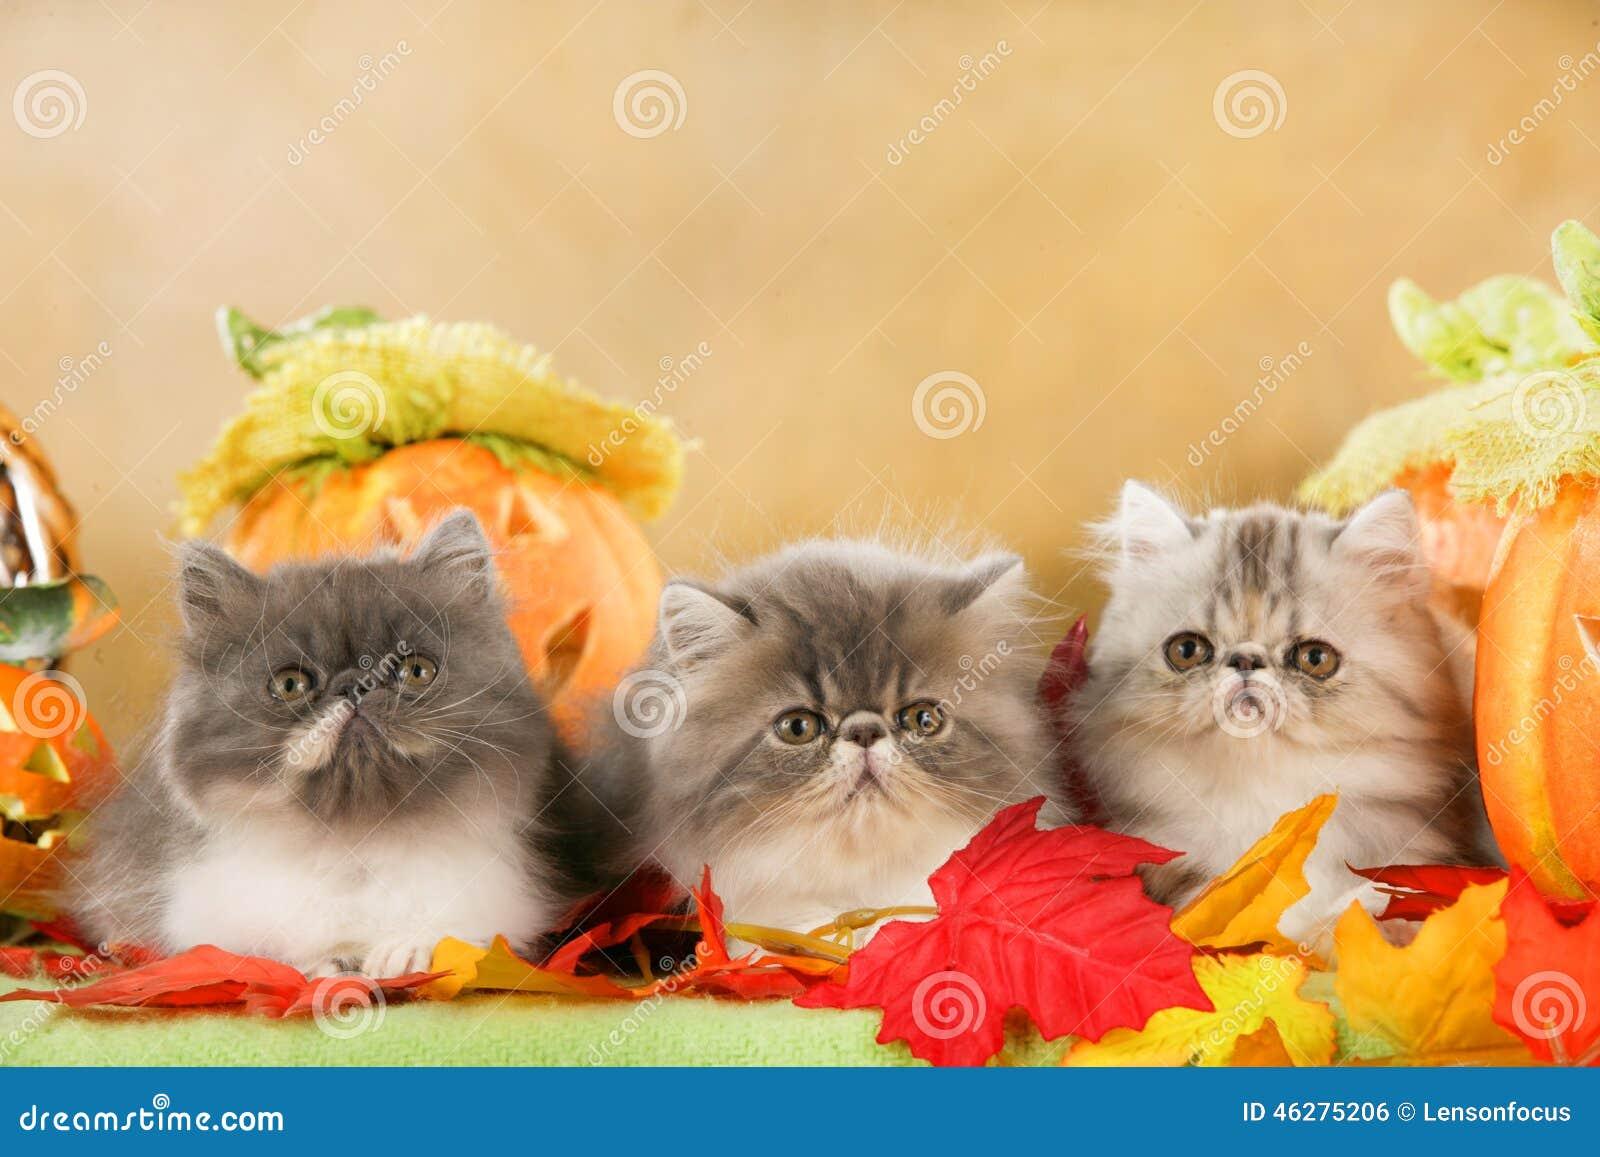 cat lynx autumn foliage - photo #36